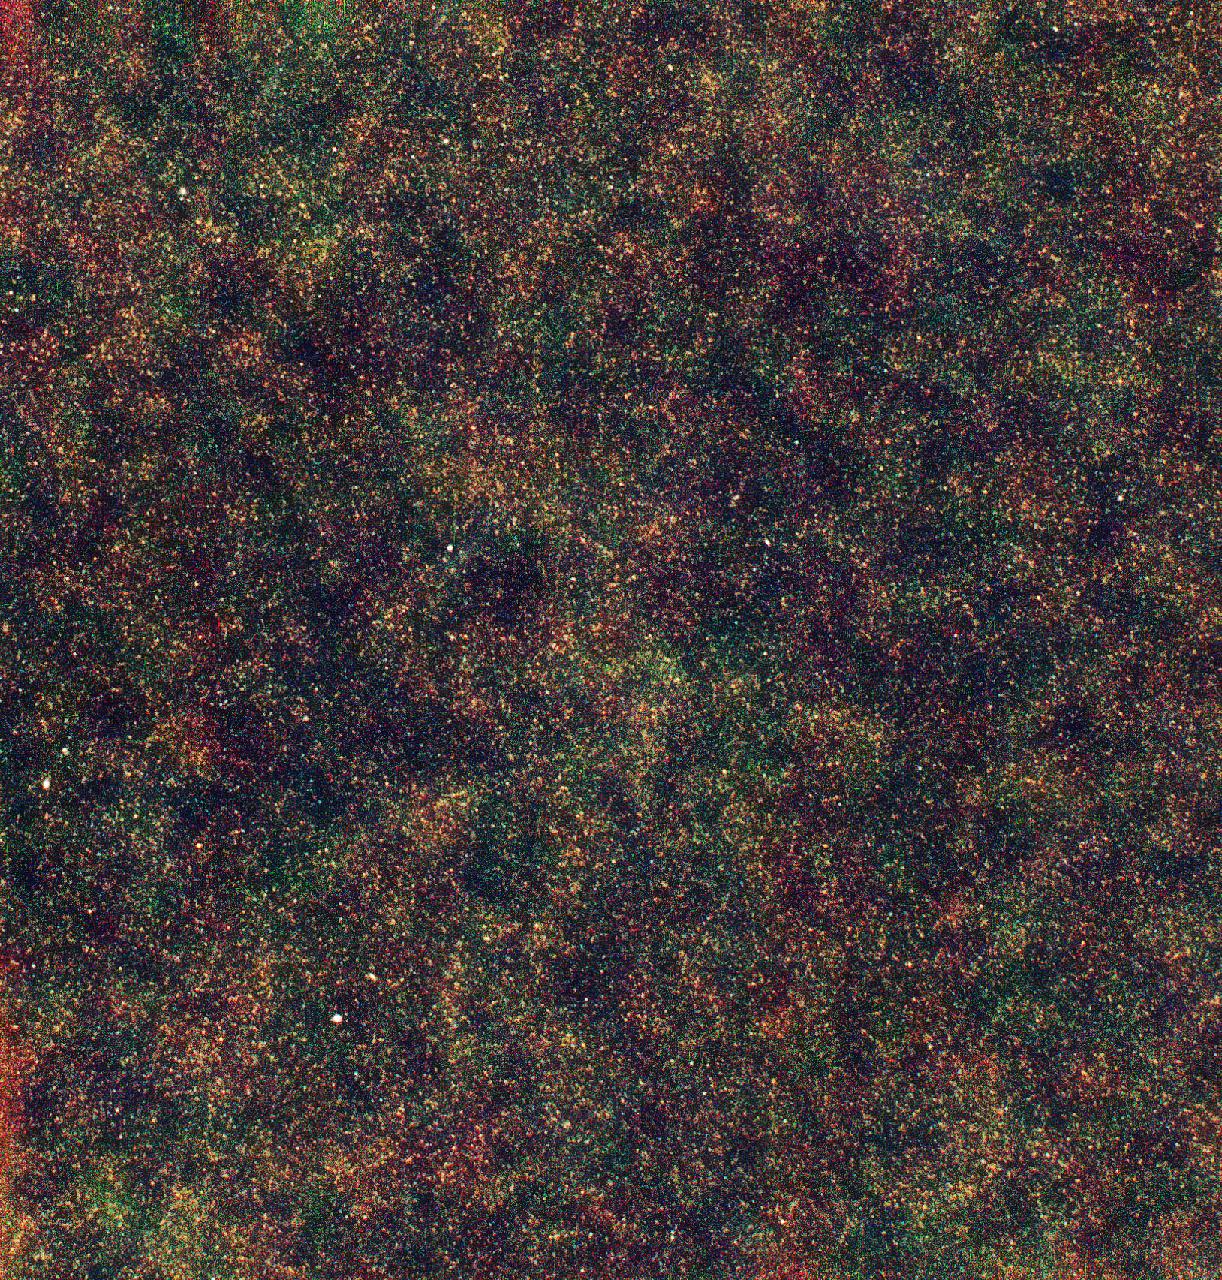 How Much Dark Matter Do Some Galaxies Need? 300 Billion Suns